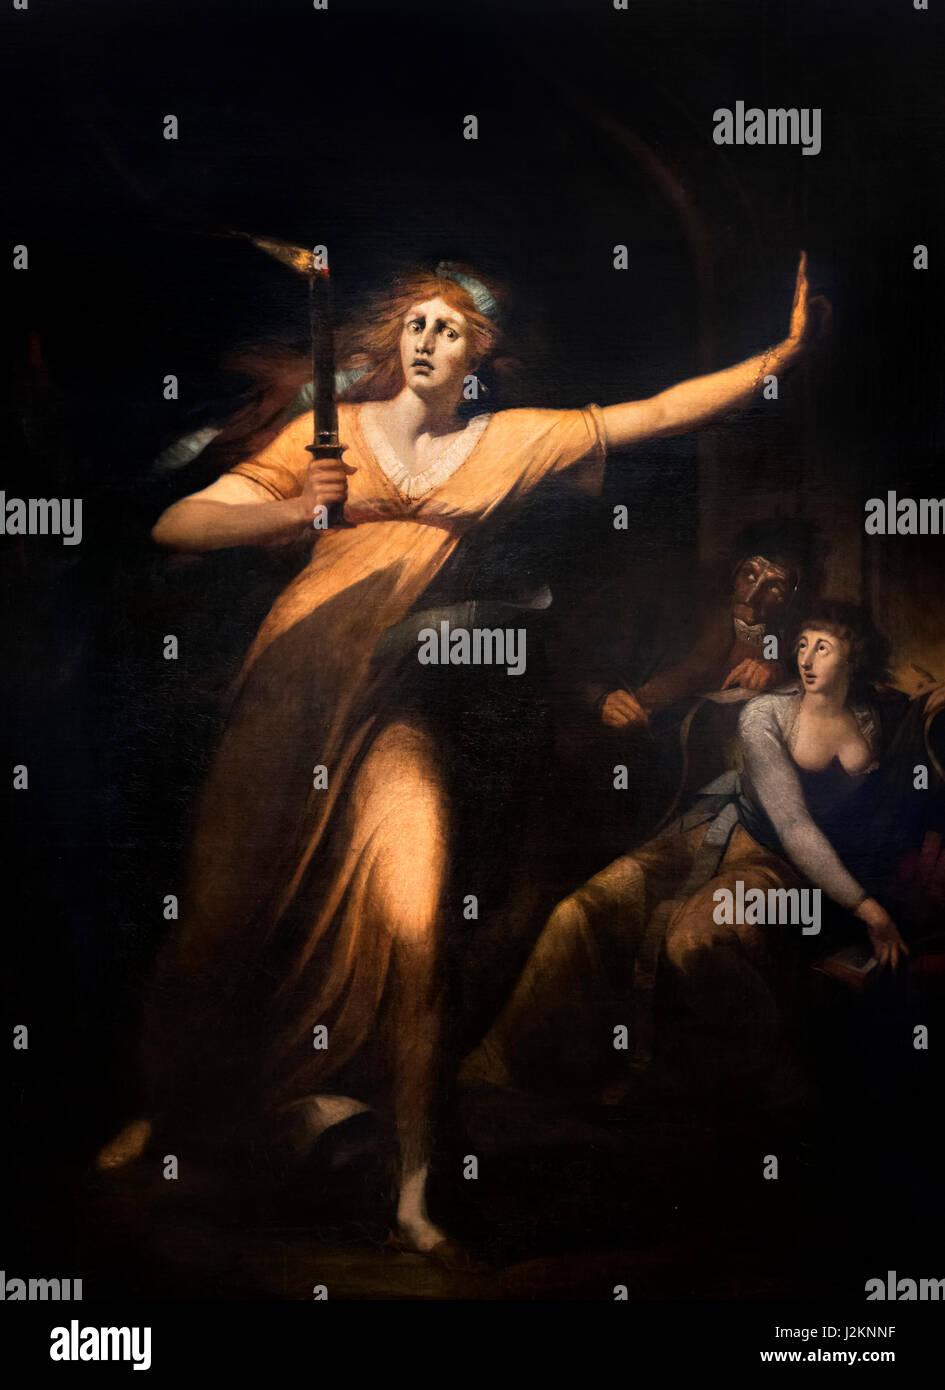 Lady Macbeth sonambulismo por Henry Fuseli (Johann Heinrich Füssli; 1741-1825), c.1784. La pintura representa Imagen De Stock